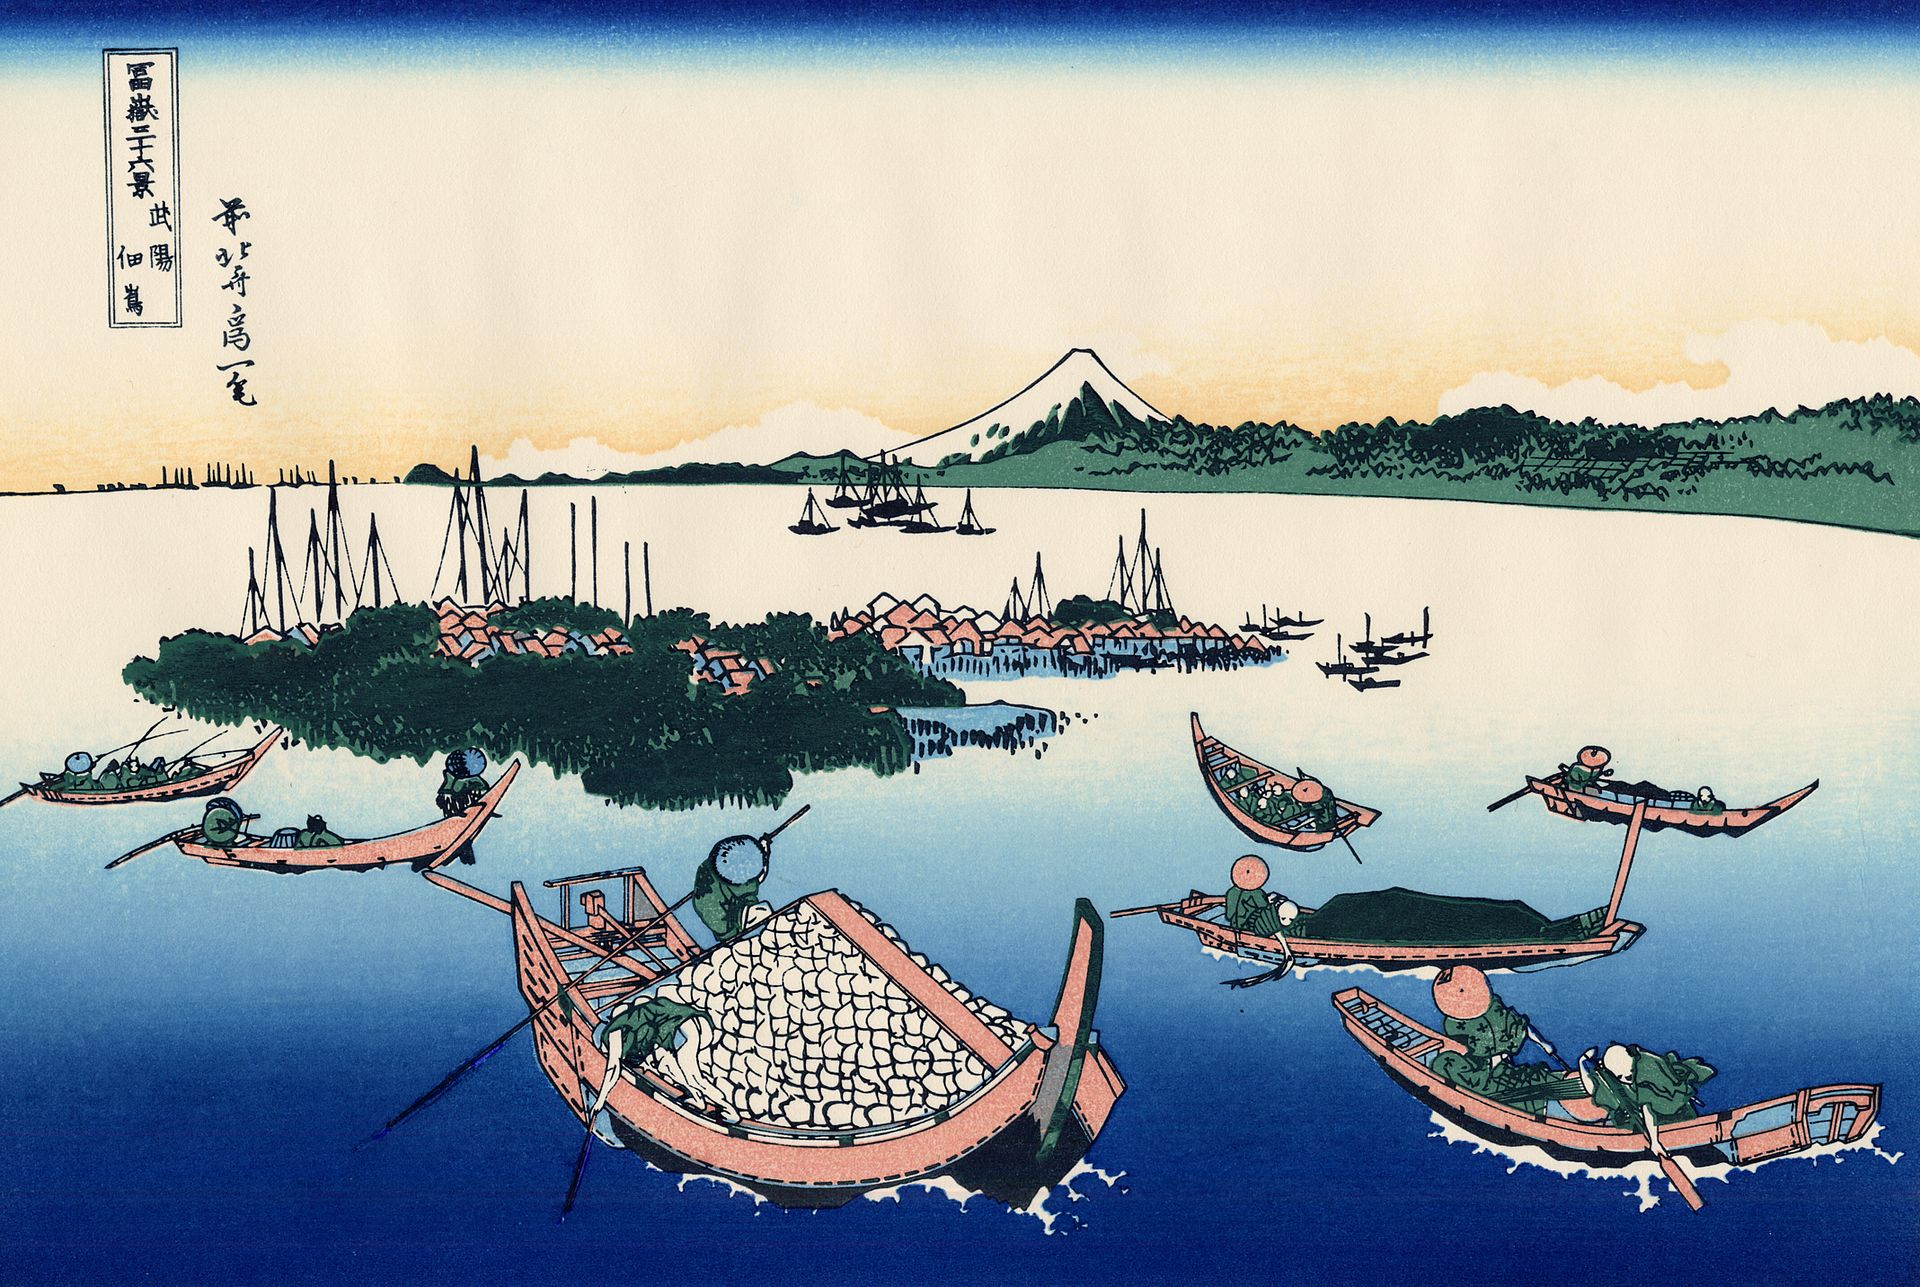 1920px-Tsukada_Island_in_the_Musashi_province.jpg